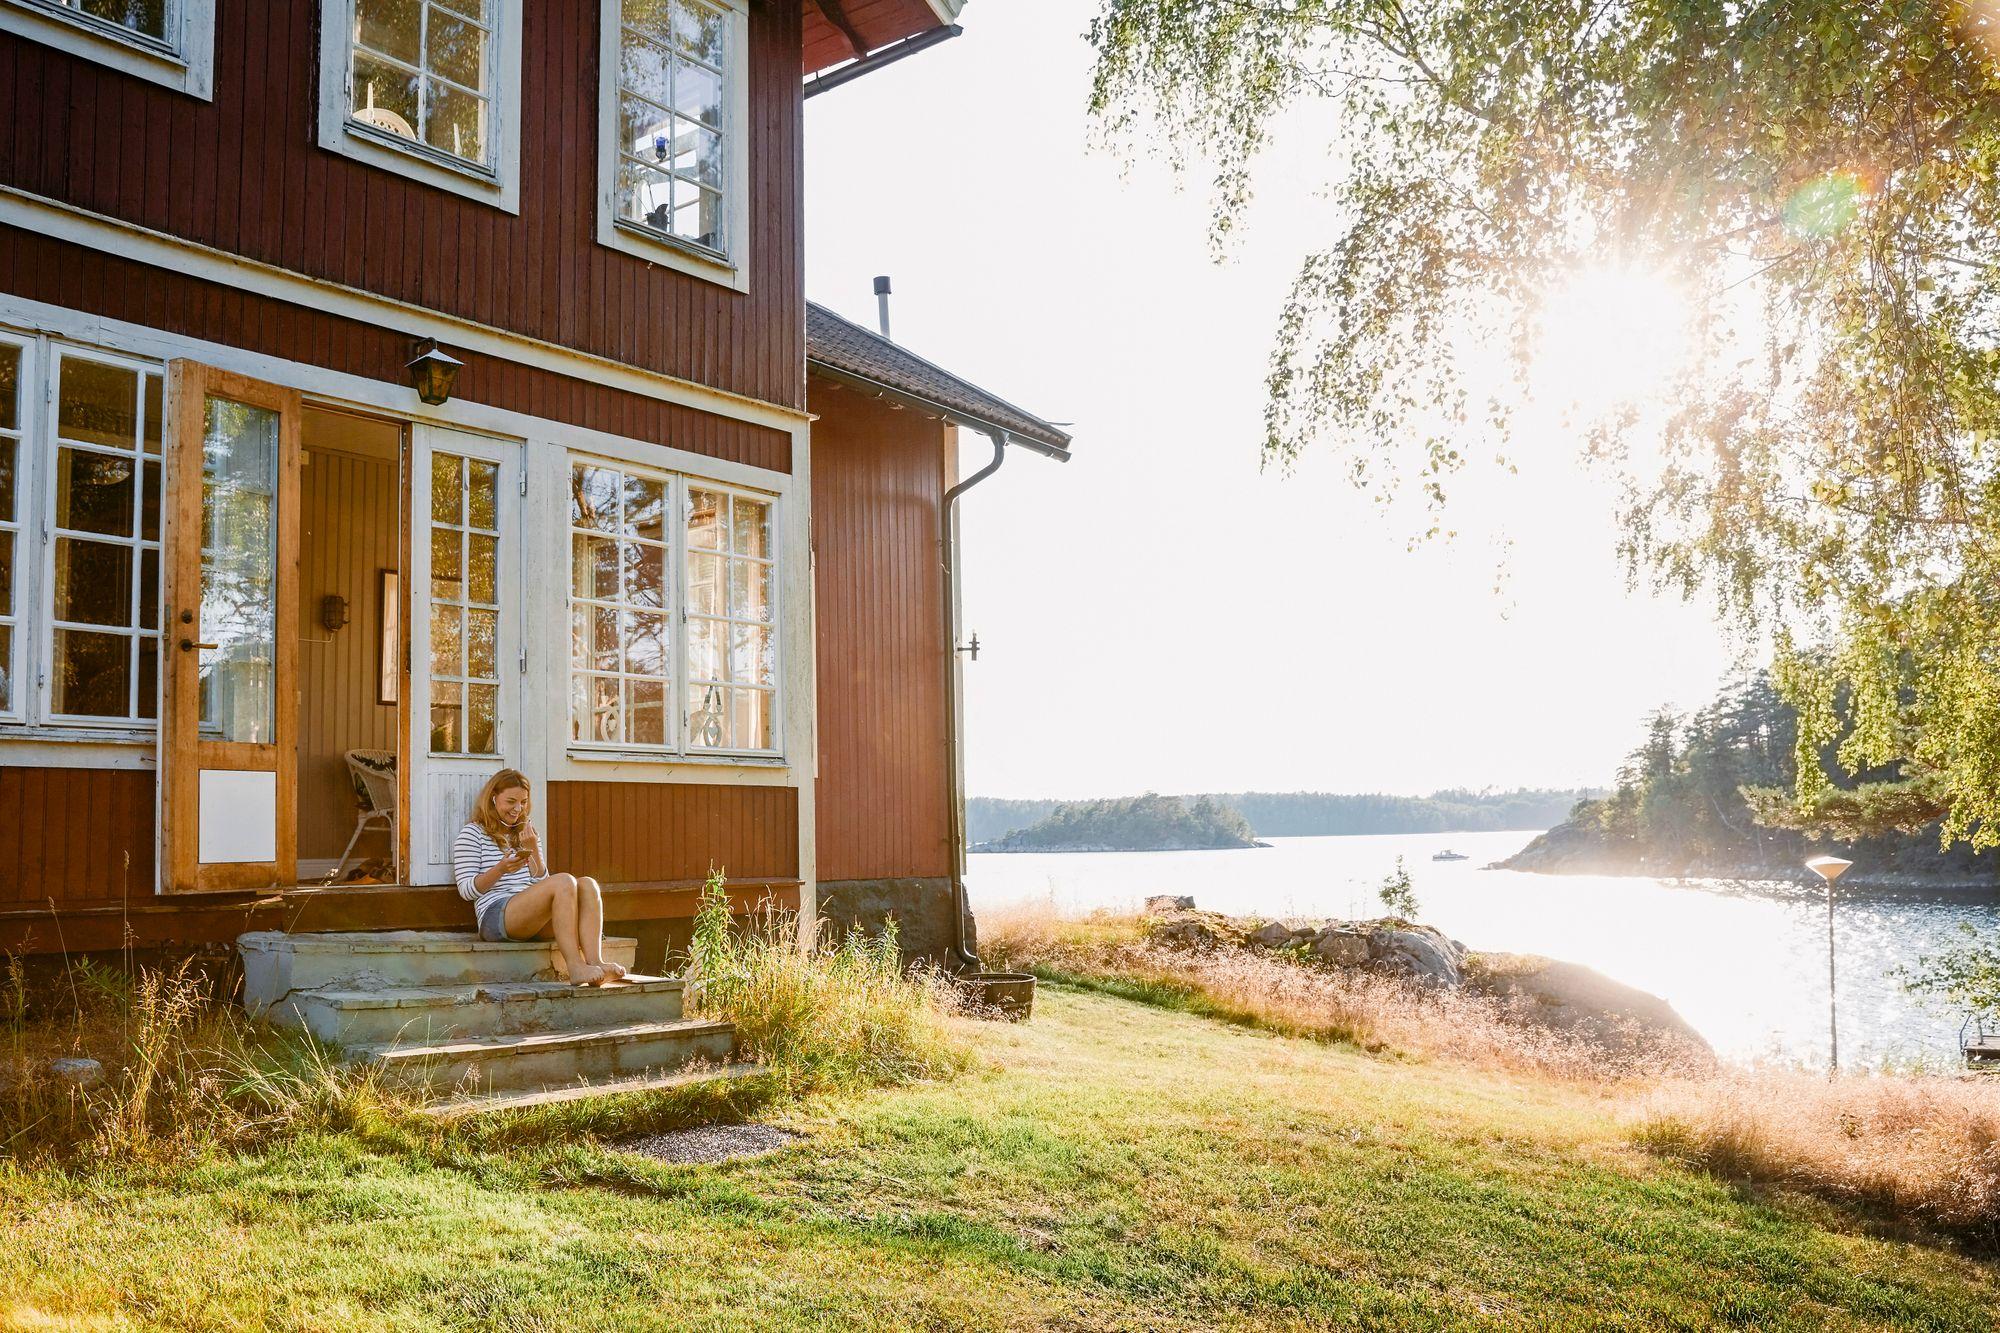 Maine vacation rental alternatives for a last-minute summer getaway